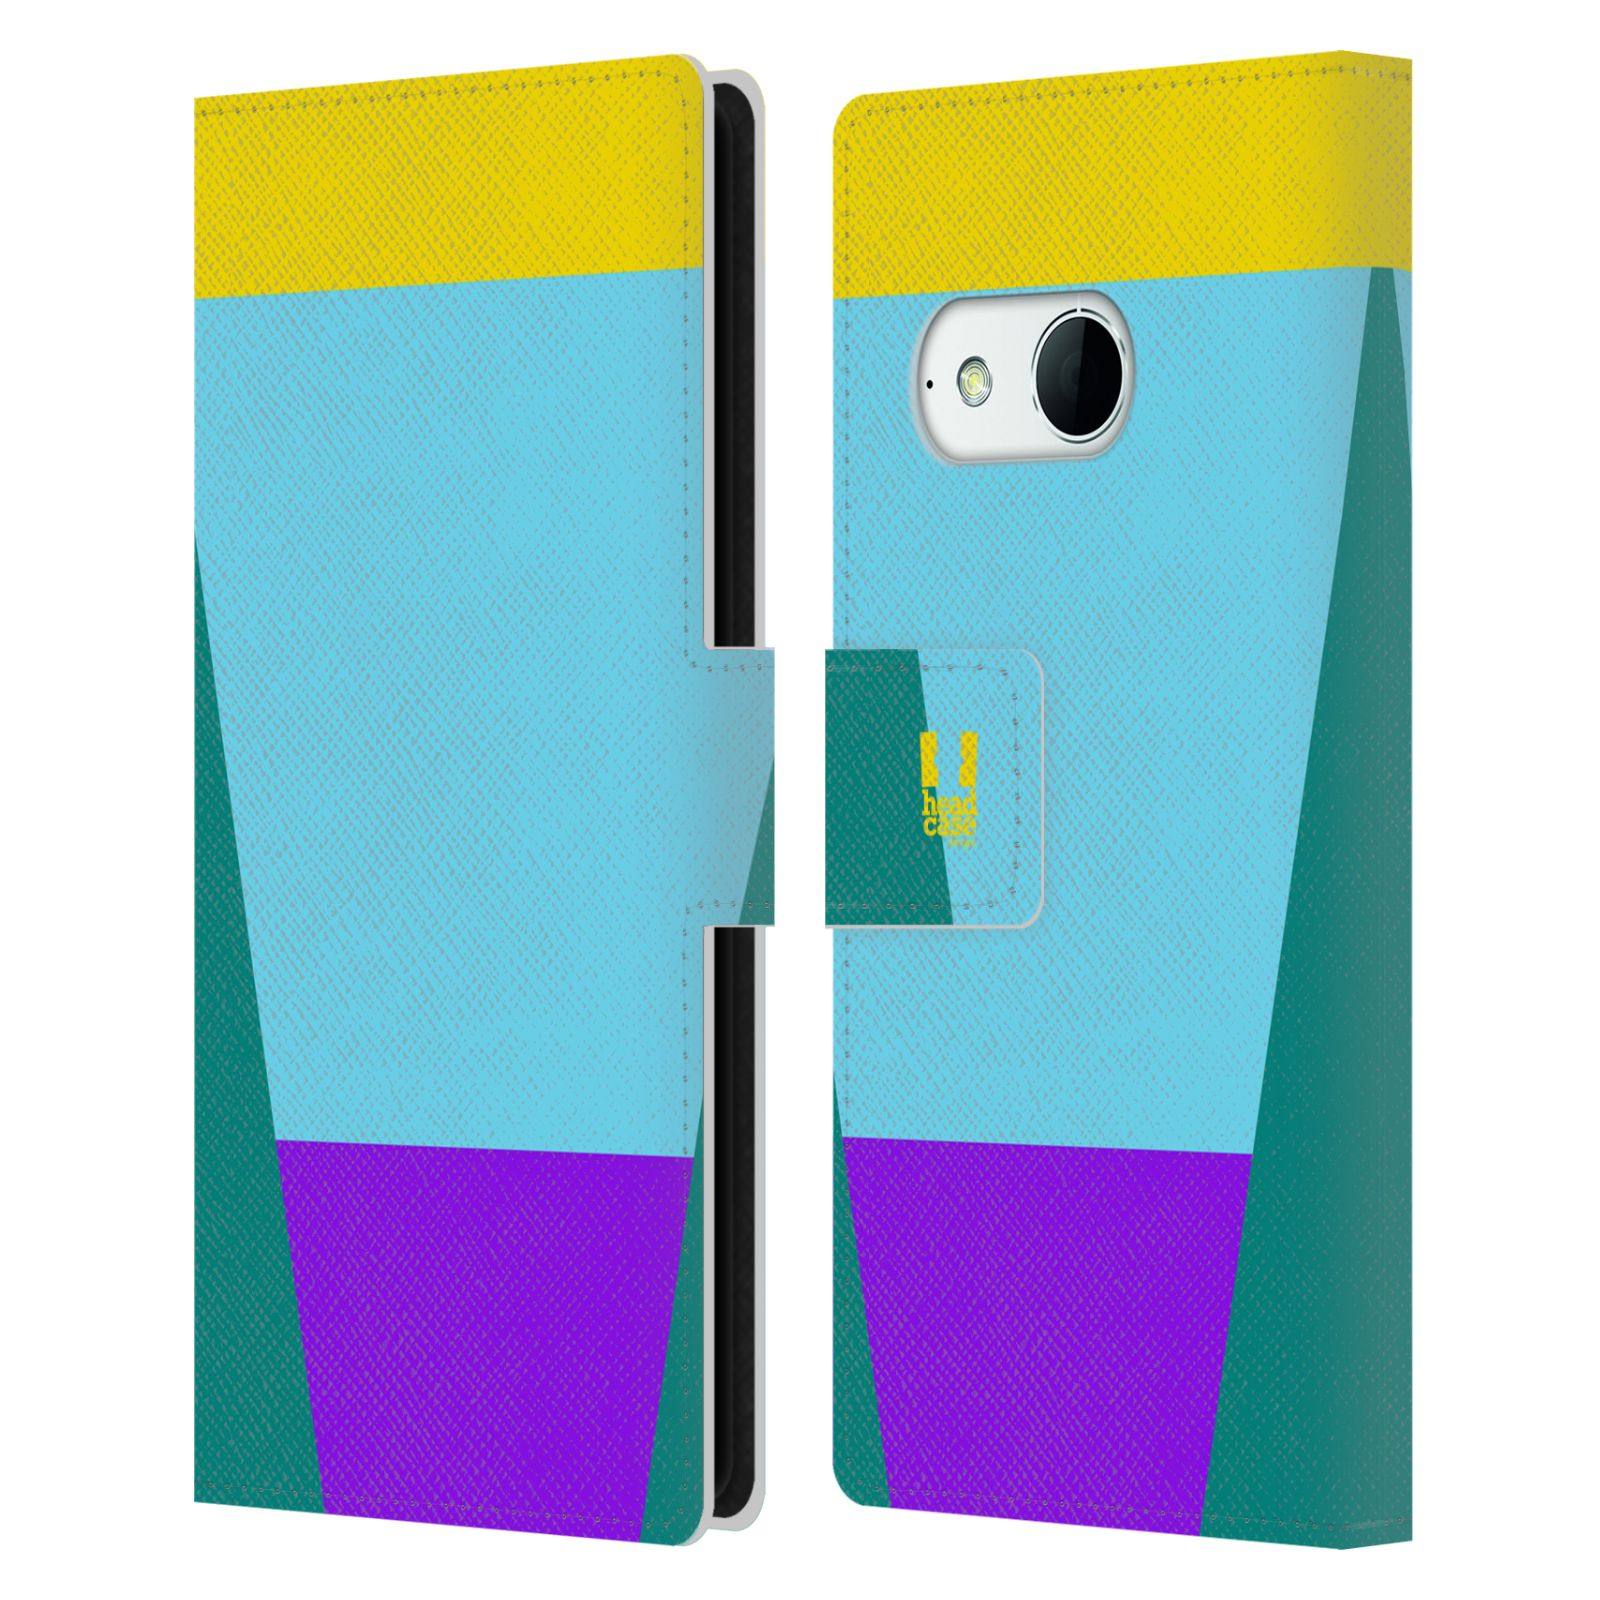 HEAD CASE Flipové pouzdro pro mobil HTC ONE MINI 2 barevné tvary nebesky modrá